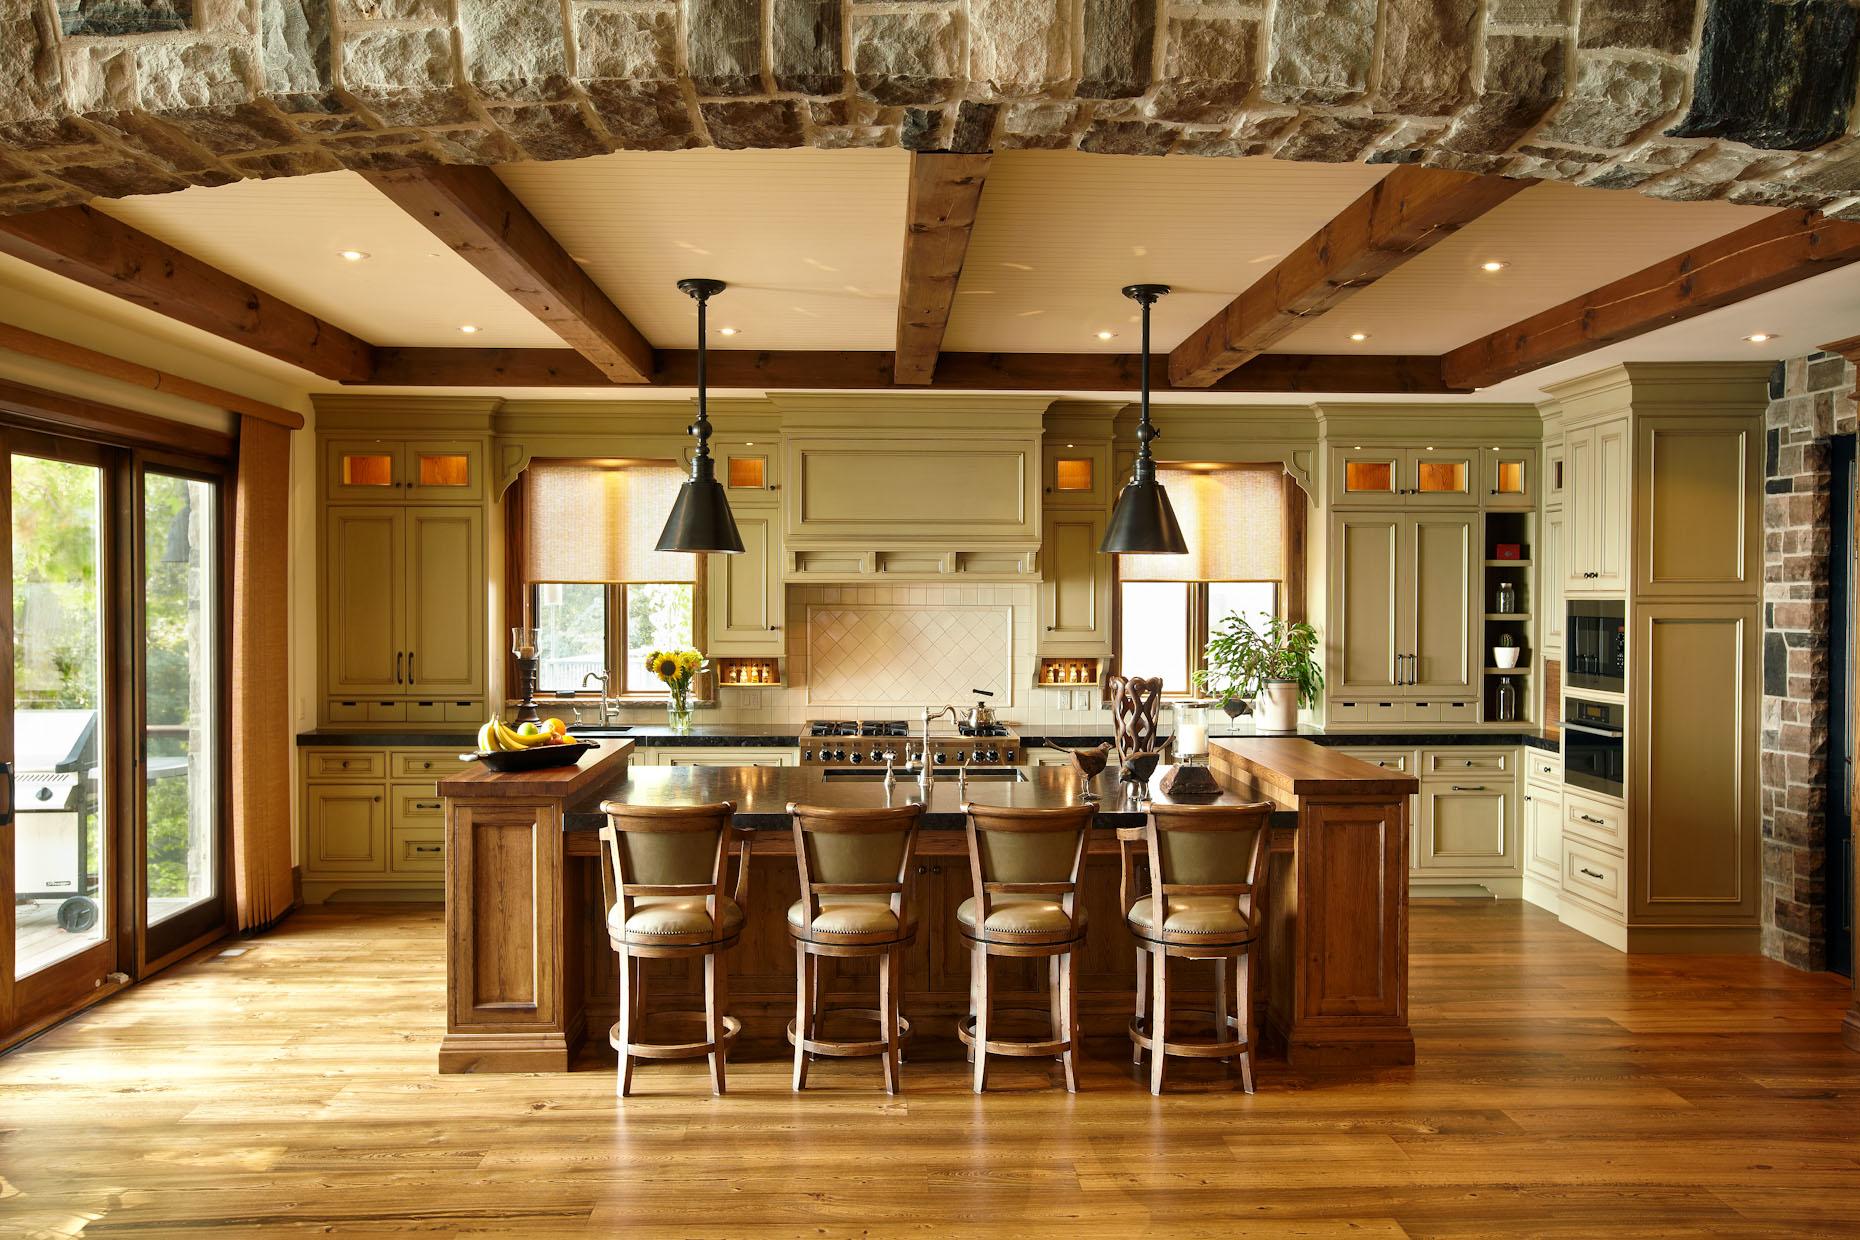 Architectural-Interior-john-trigiani-kitchen